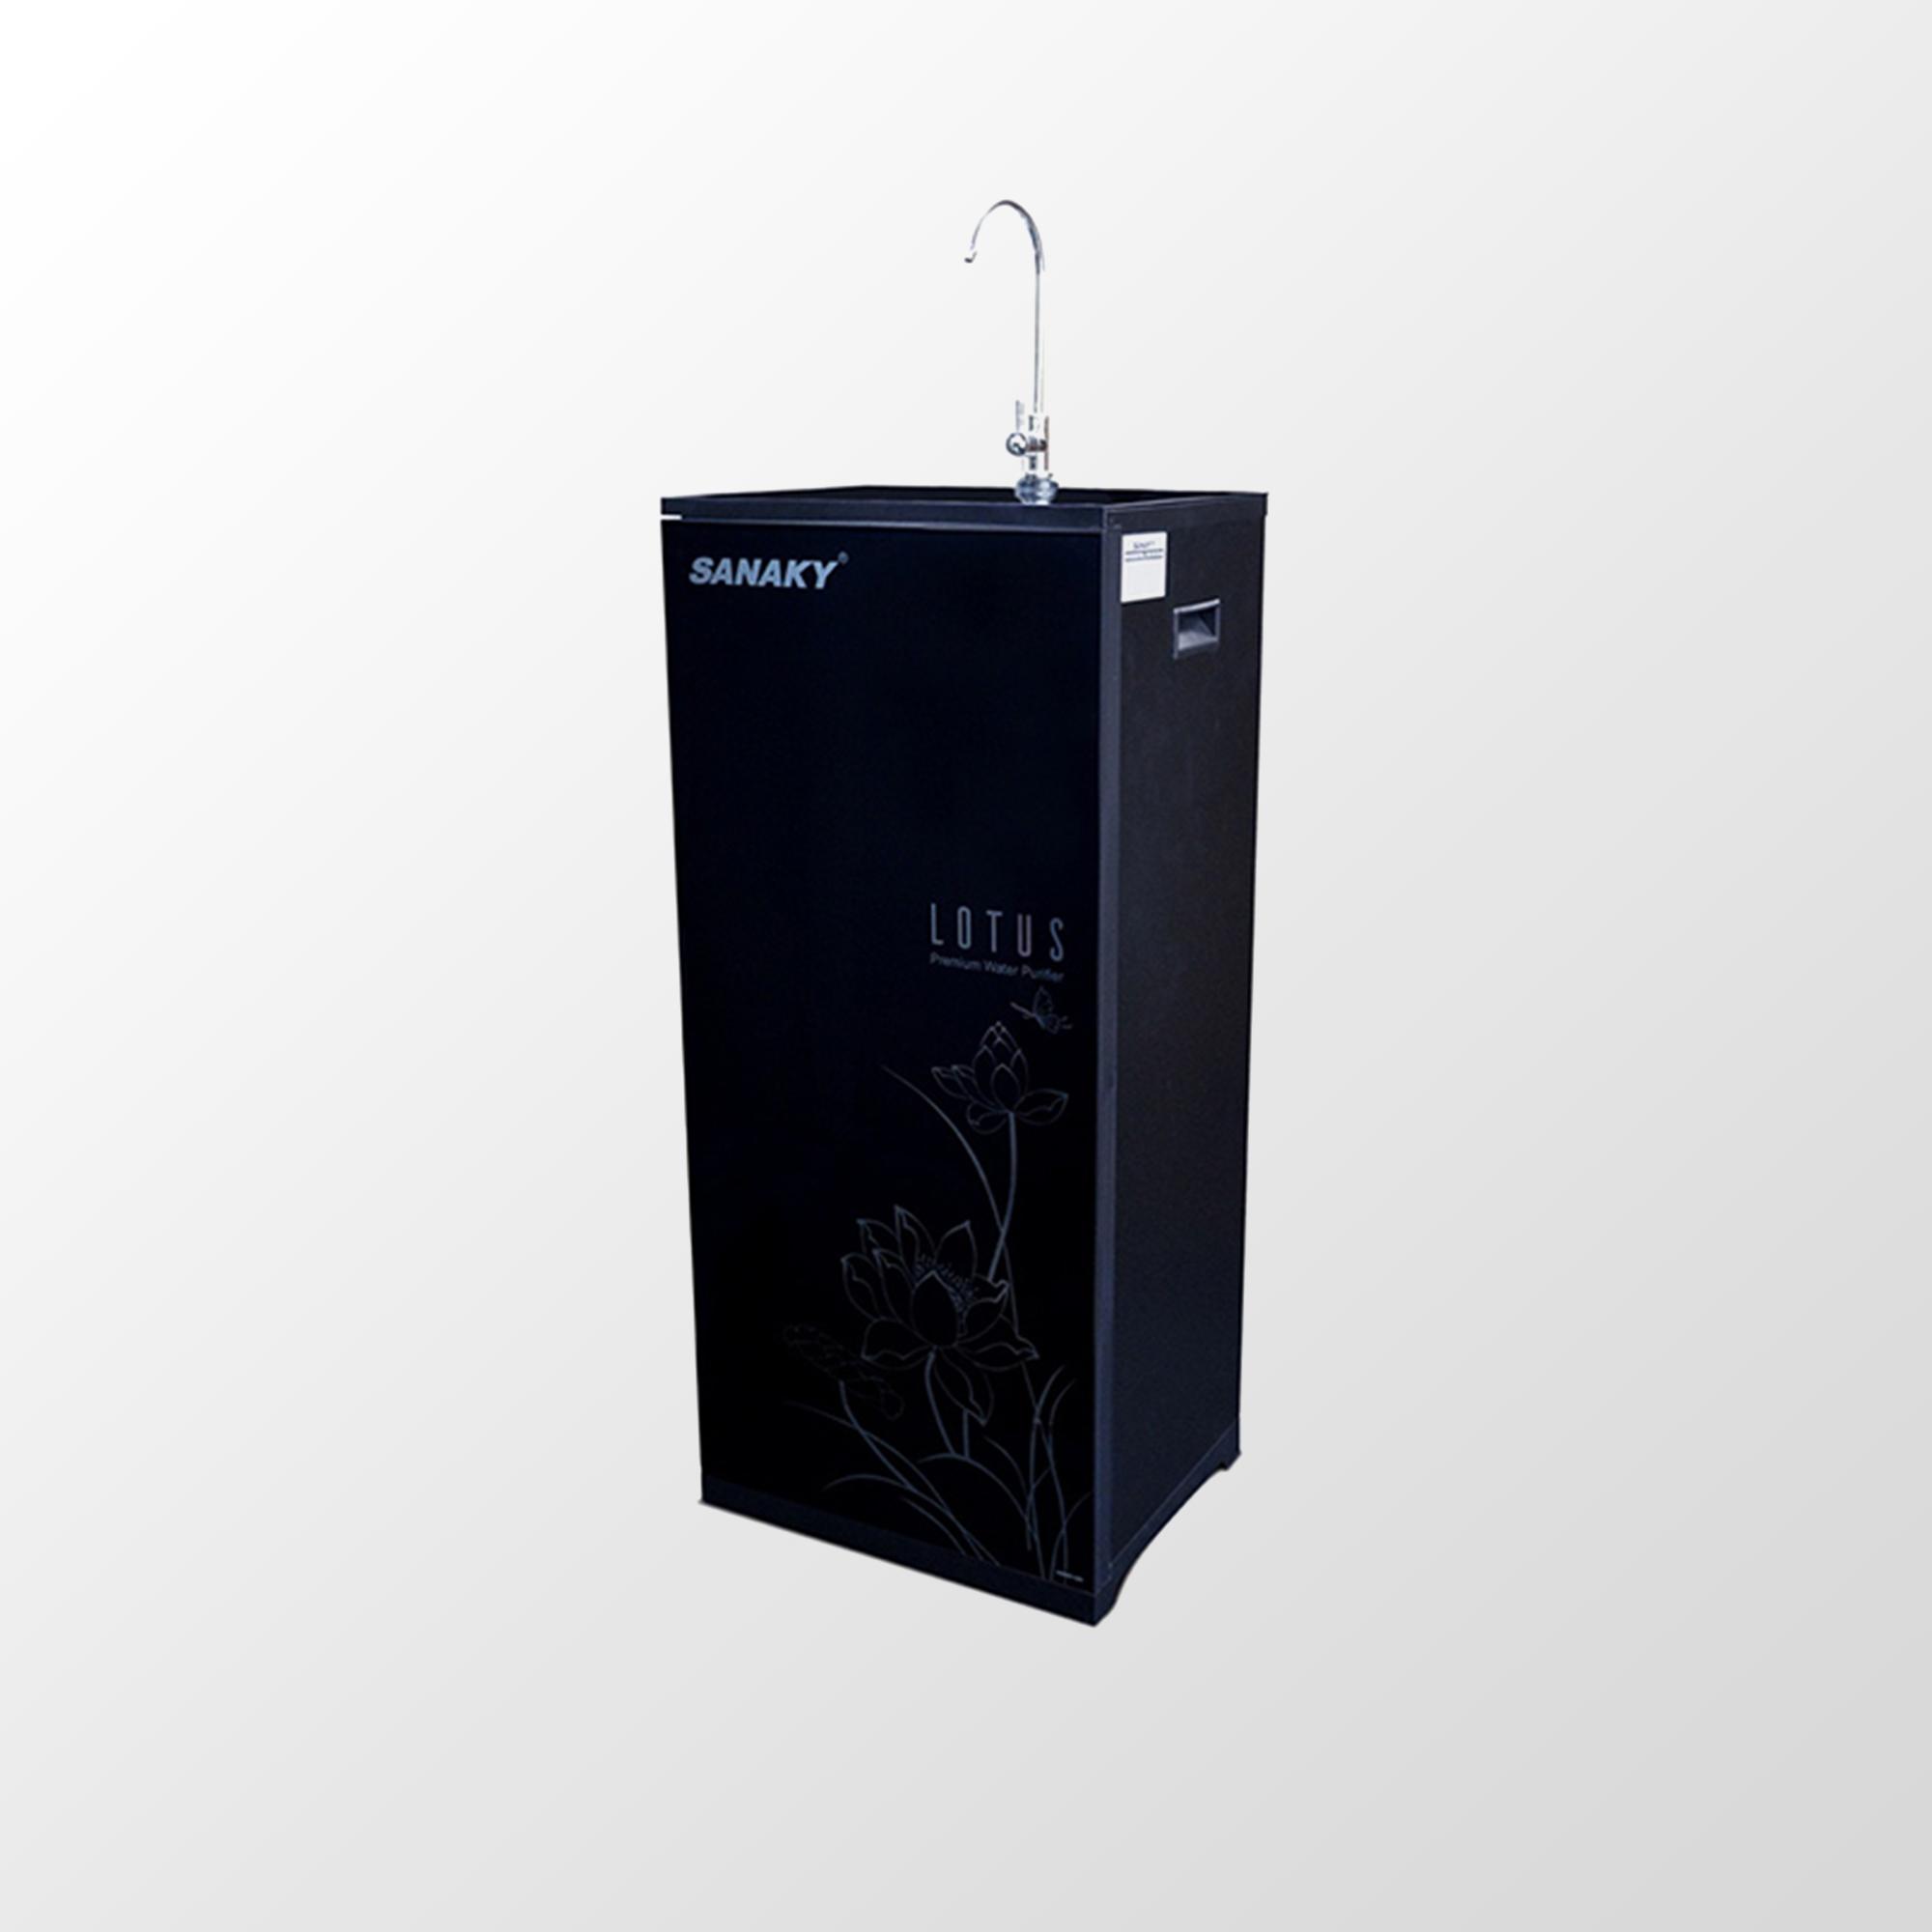 Sanaky water purifier